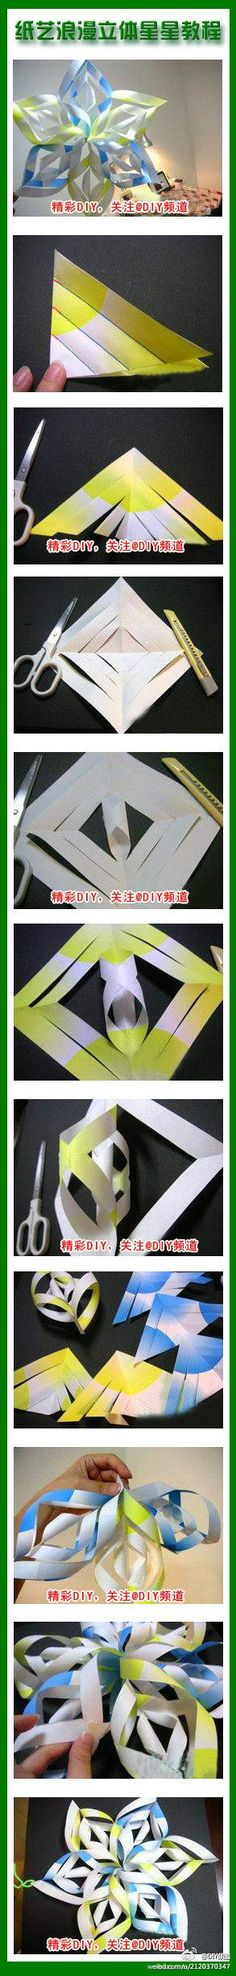 DIY Modular 3D Paper Star DIY Projects